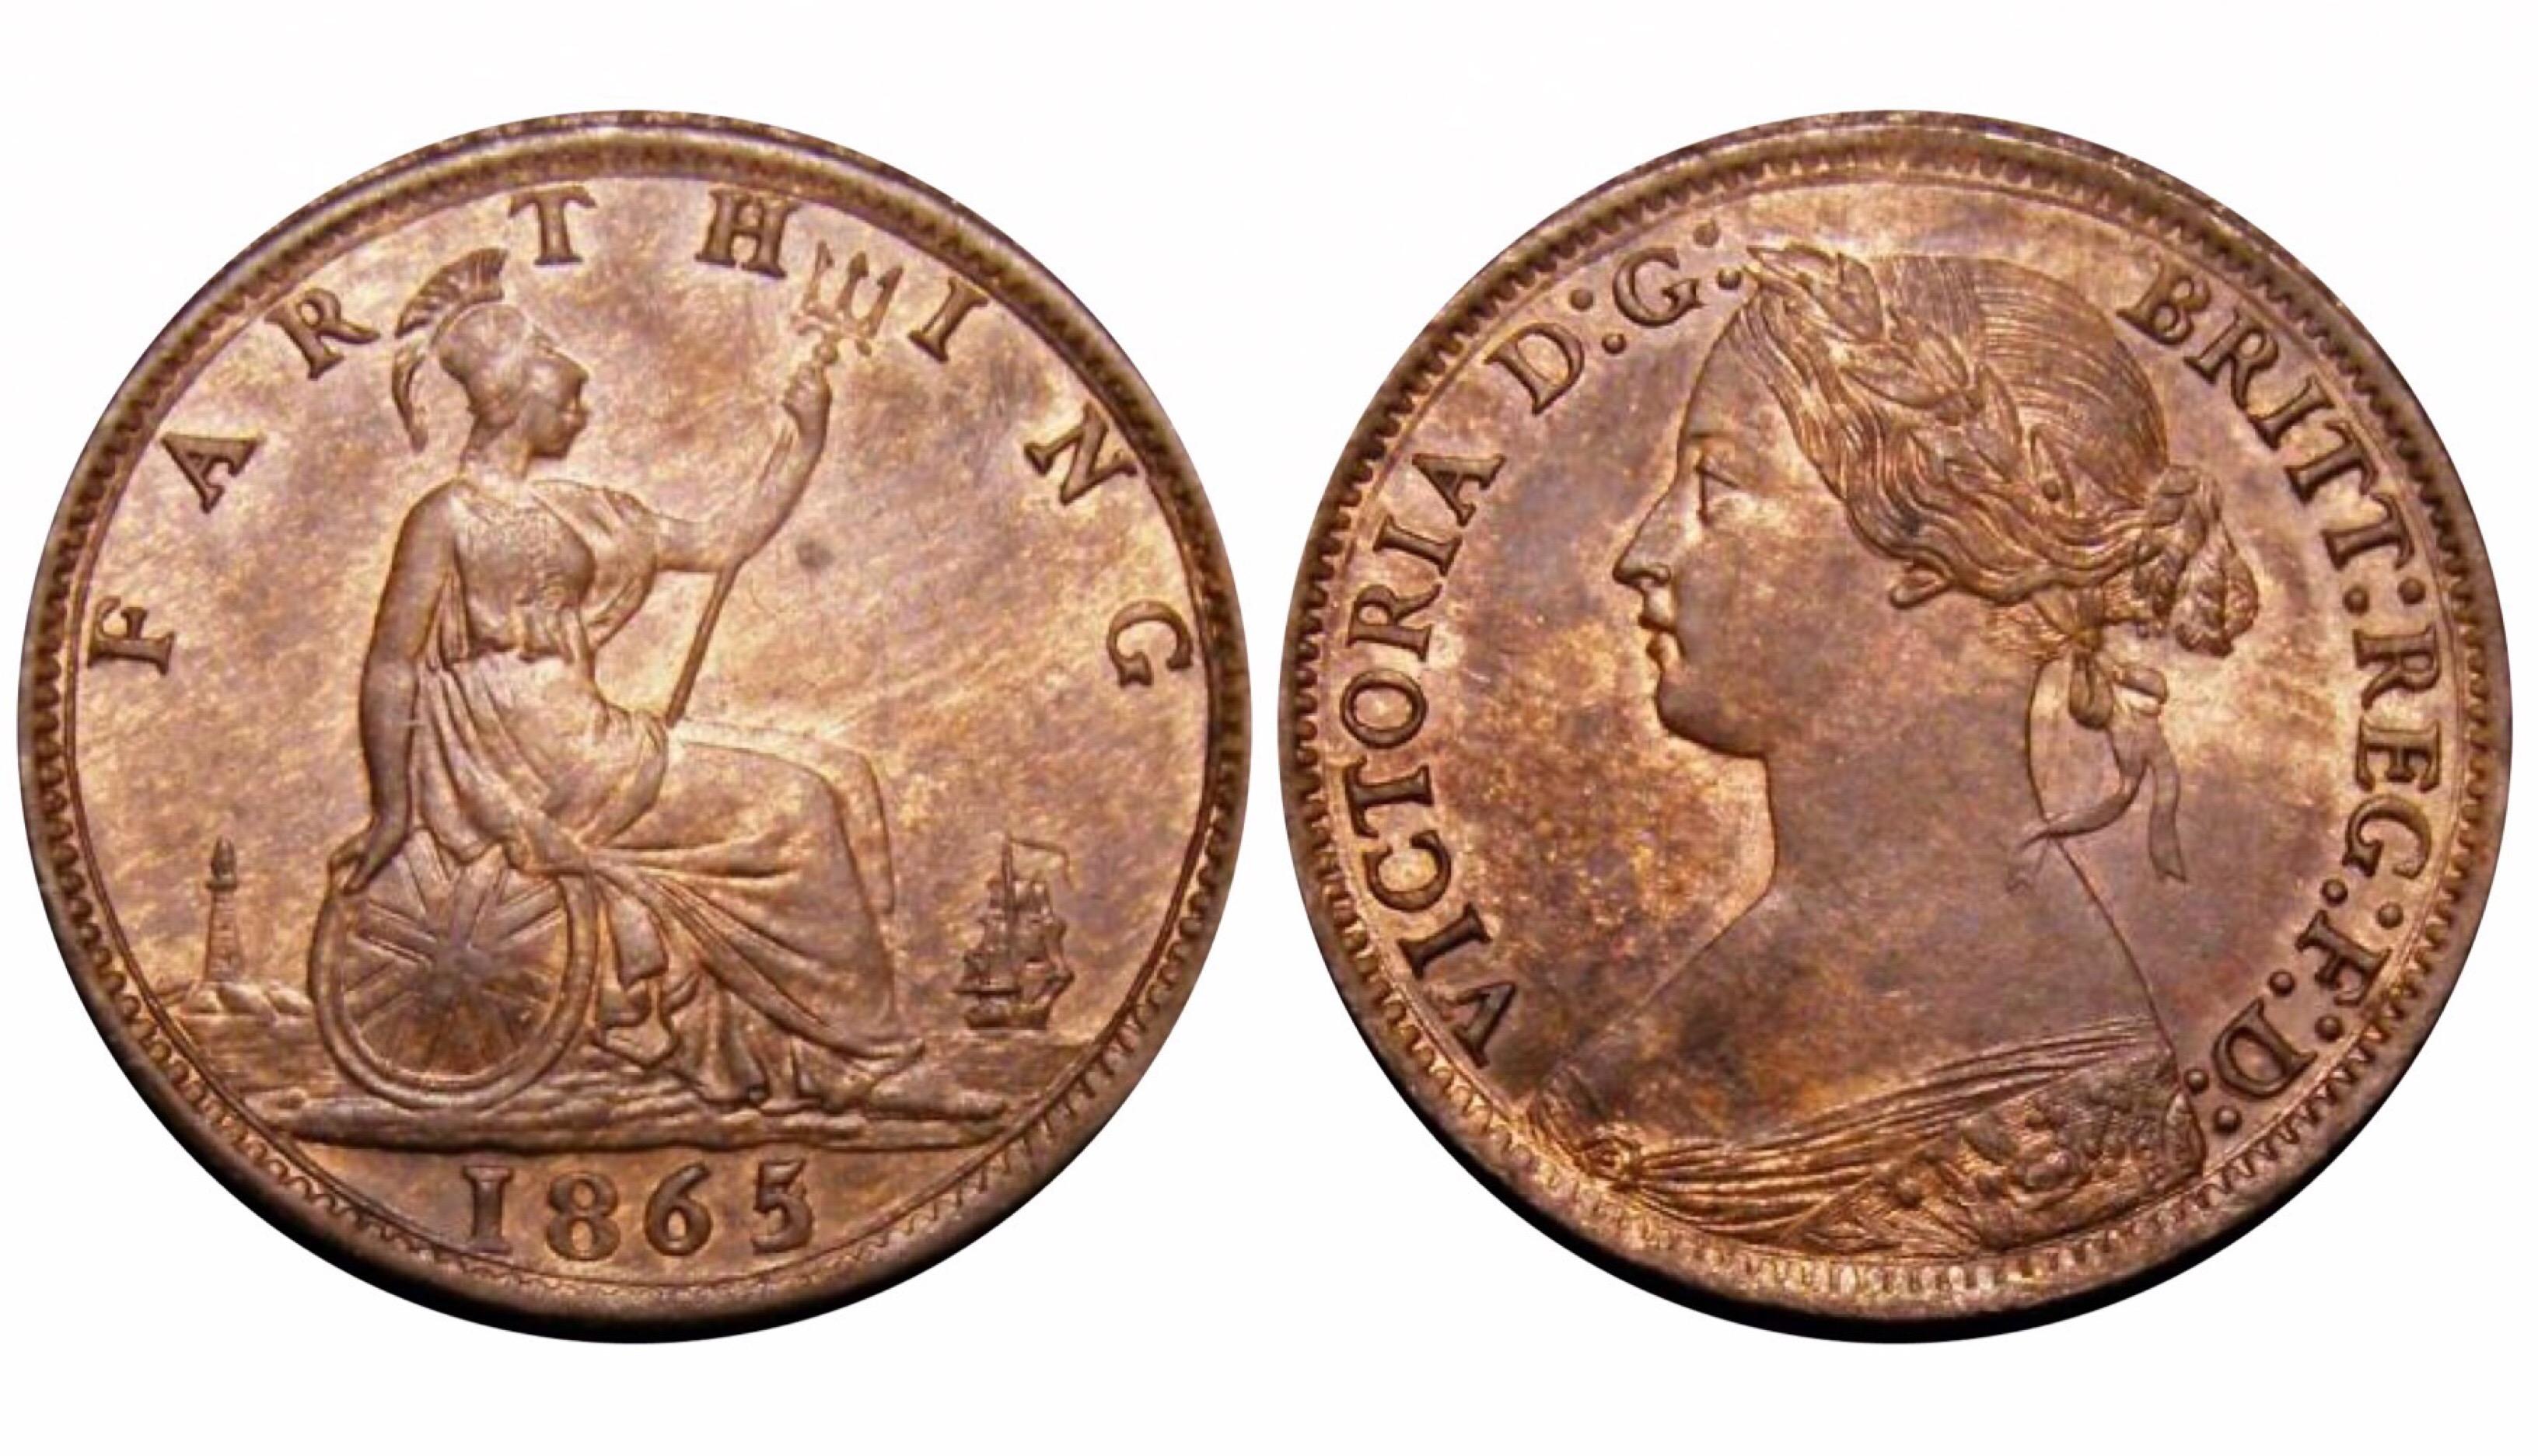 1865/2 Farthing, CGS 65(MS60 -61), gEF, Victoria, Freeman 513